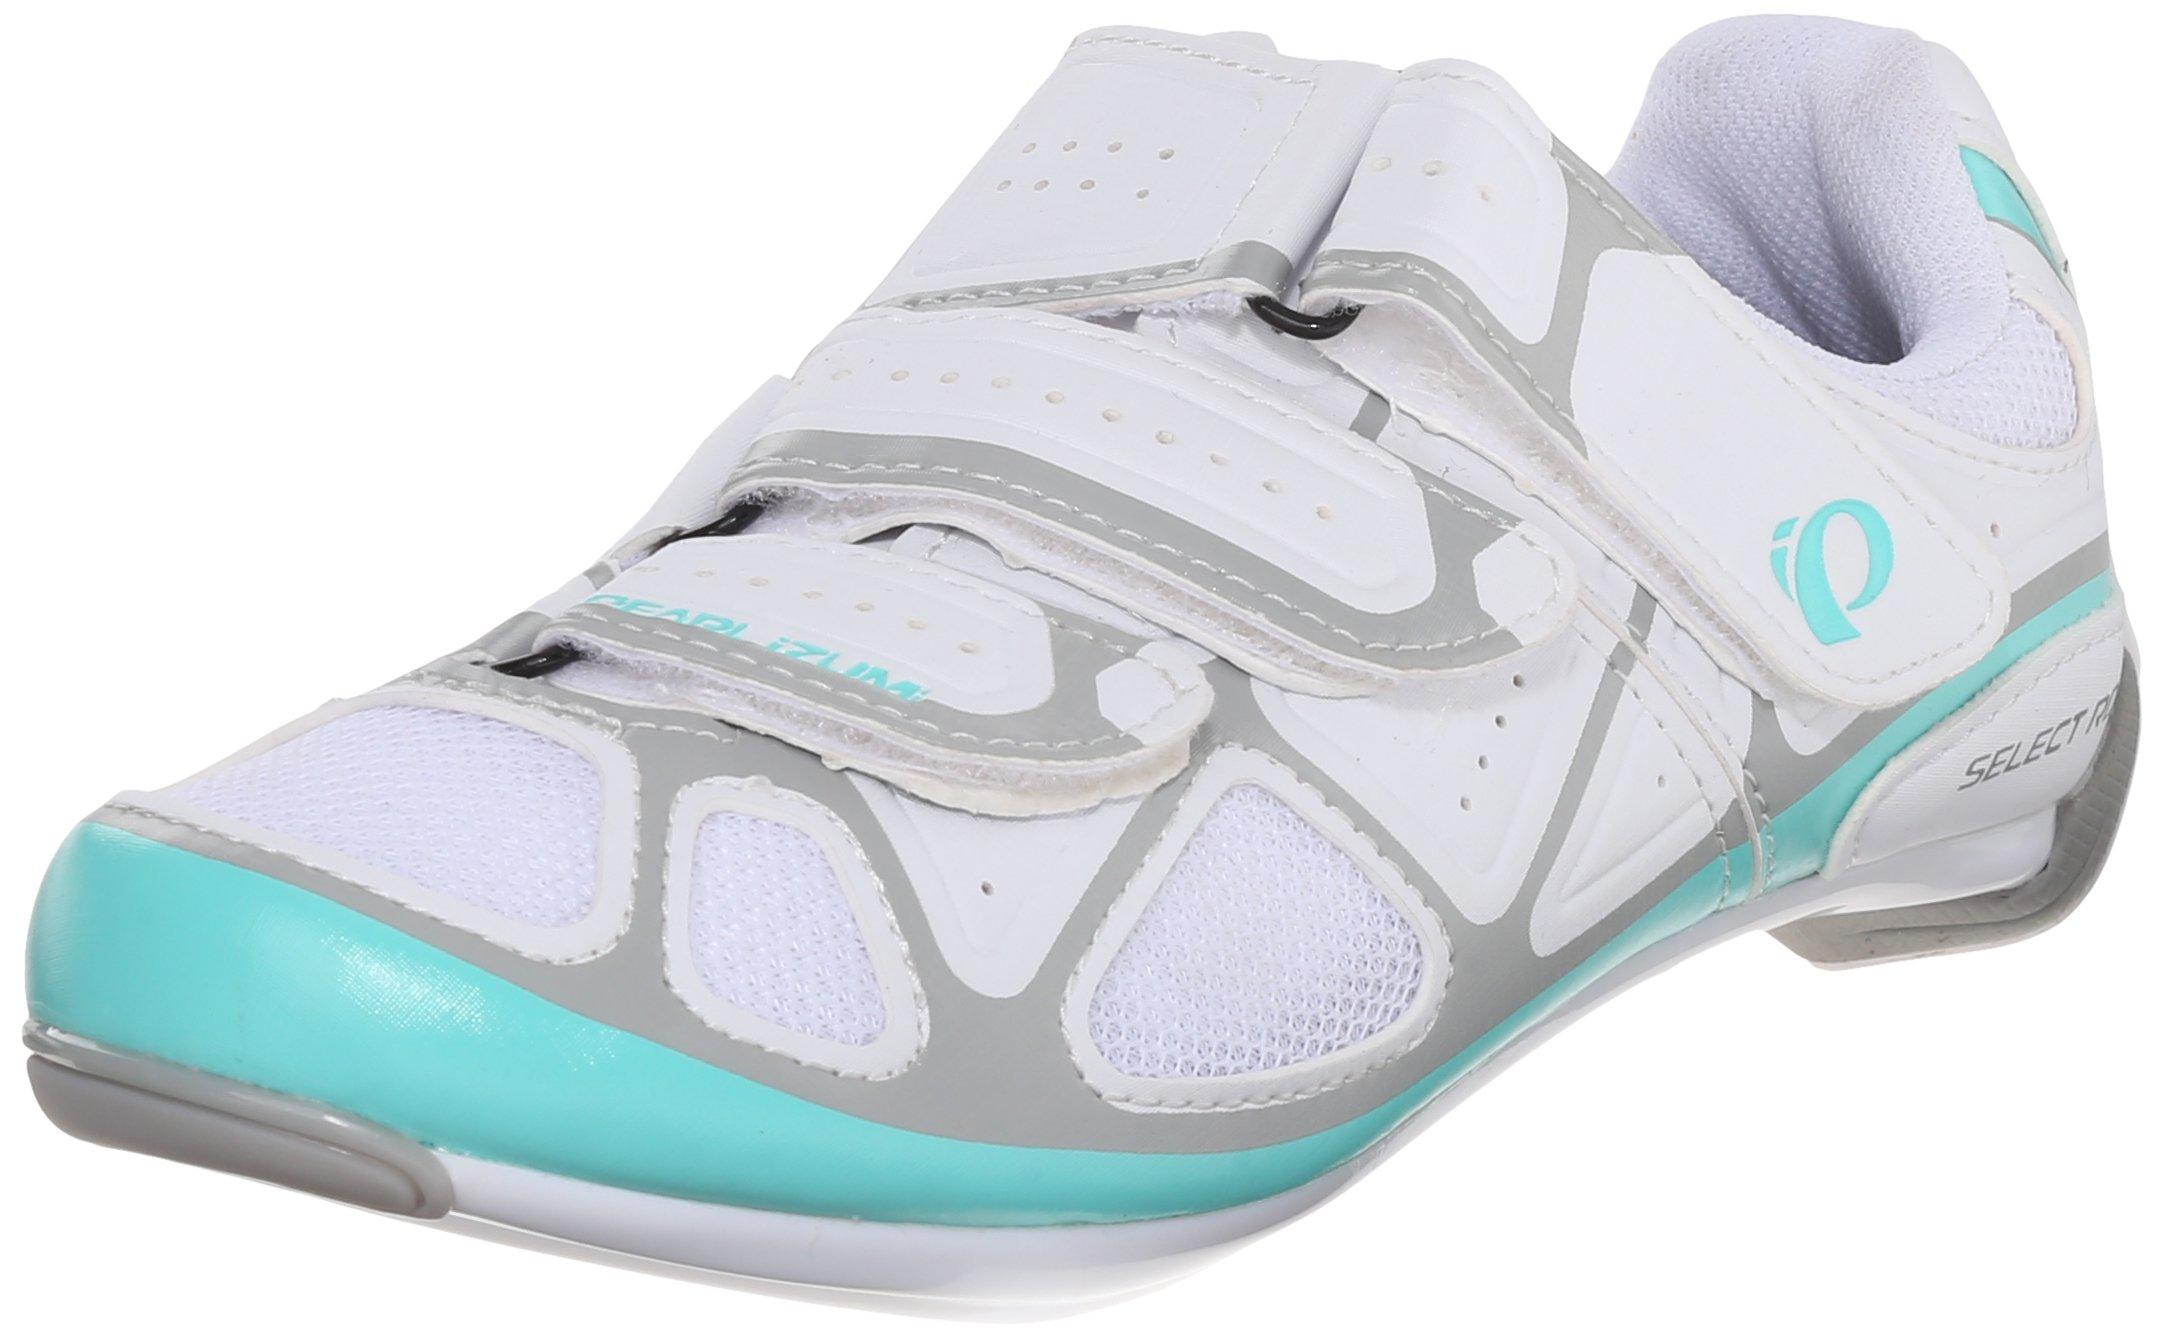 Pearl Izumi Women's W Select RD IV Cycling Shoe, White/Aqua Mint, 40 EU/8.3 B US by Pearl iZUMi (Image #1)